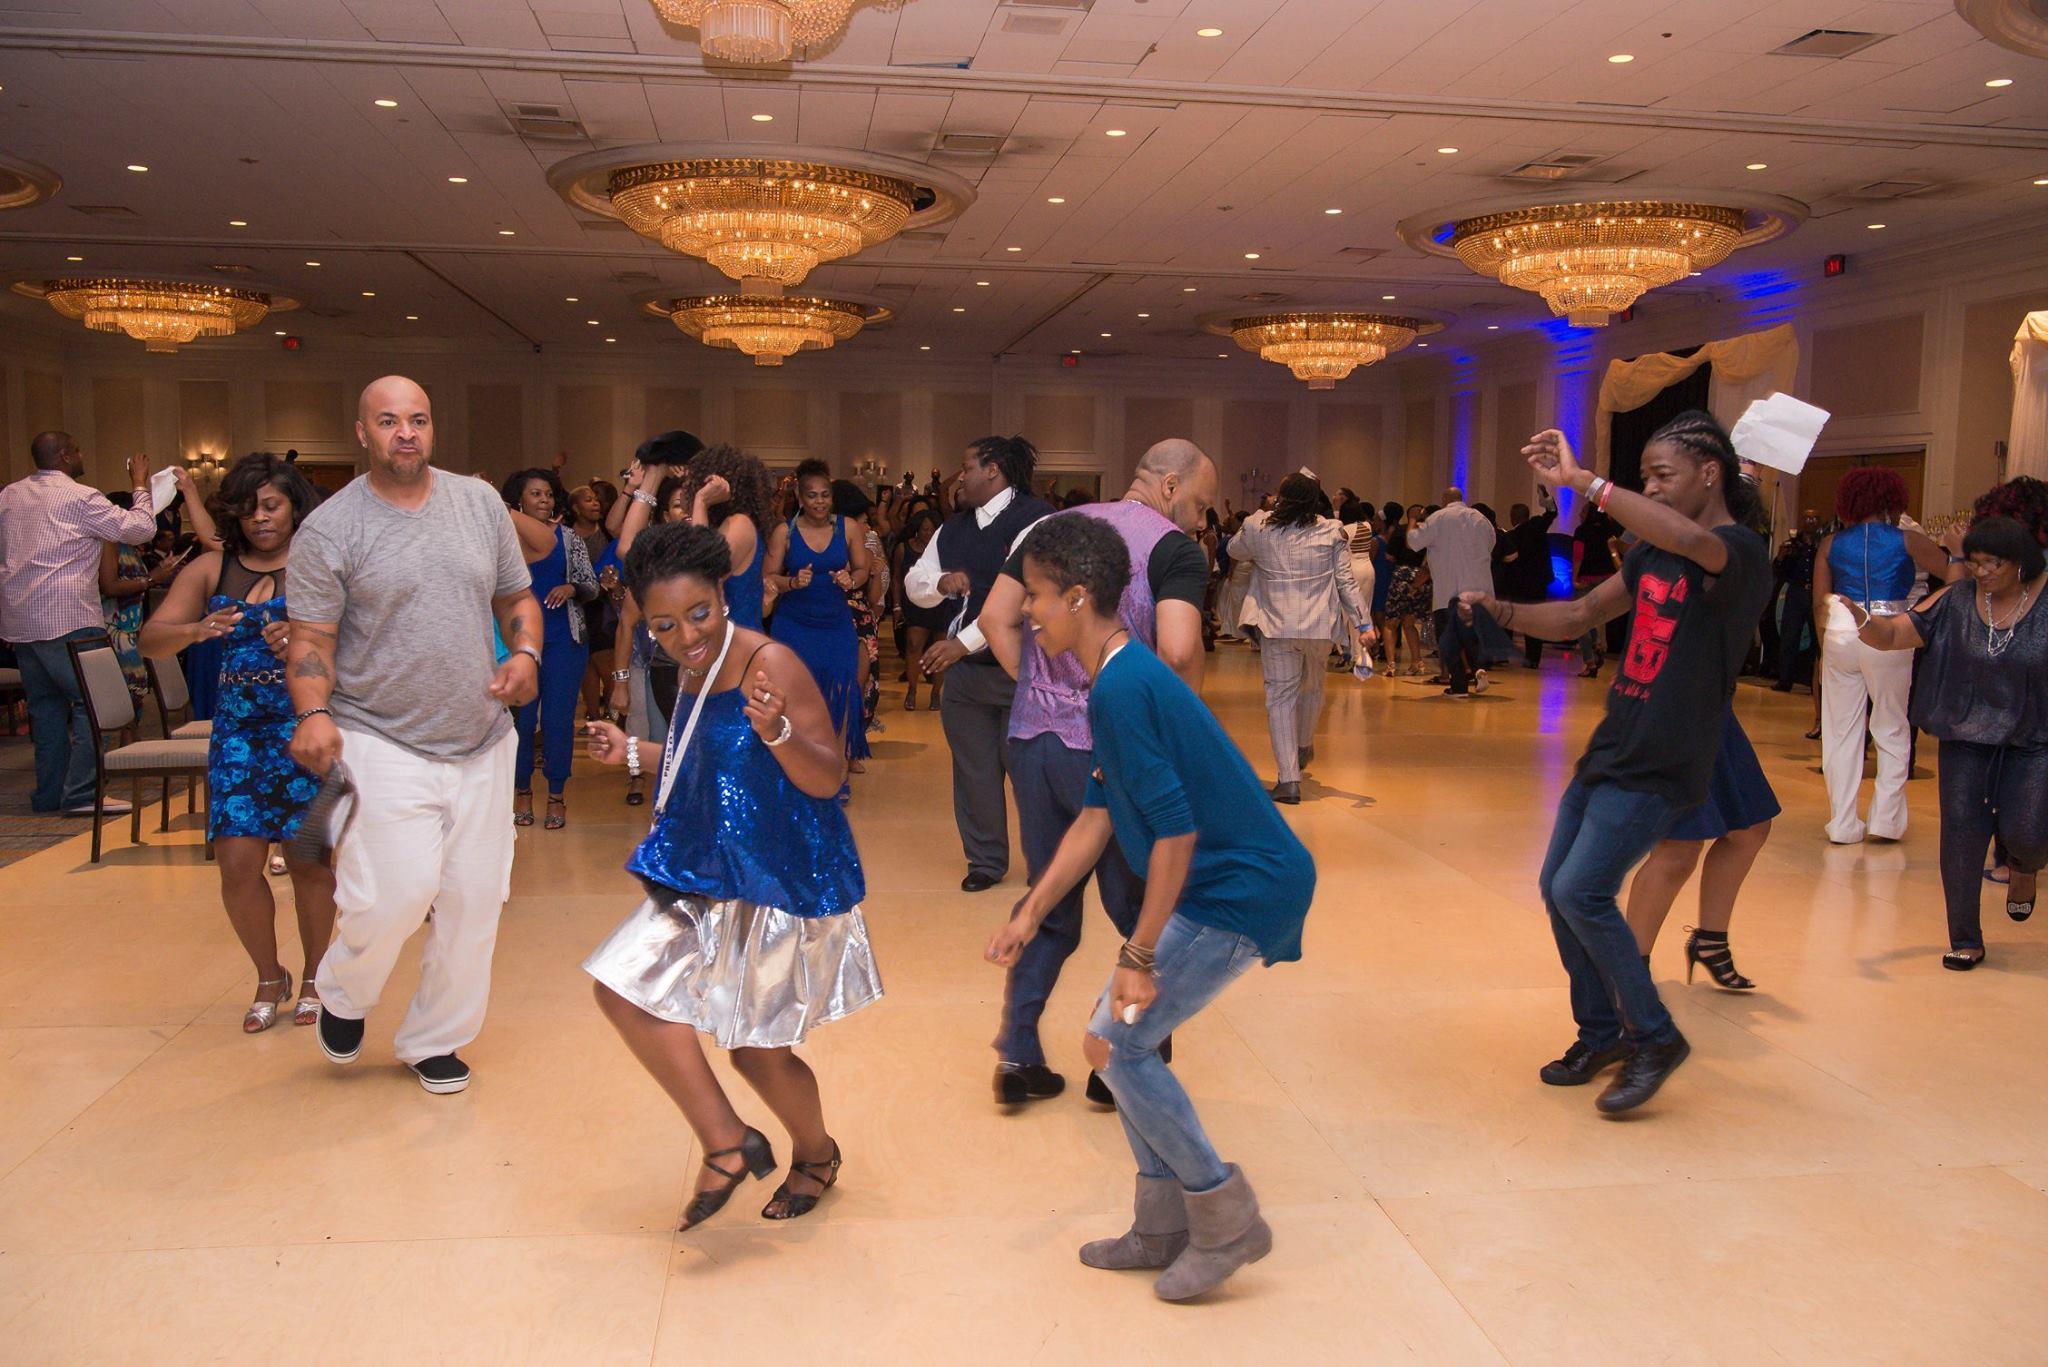 International-Swing-Dance-Championships-Houston-Texas-10.jpg